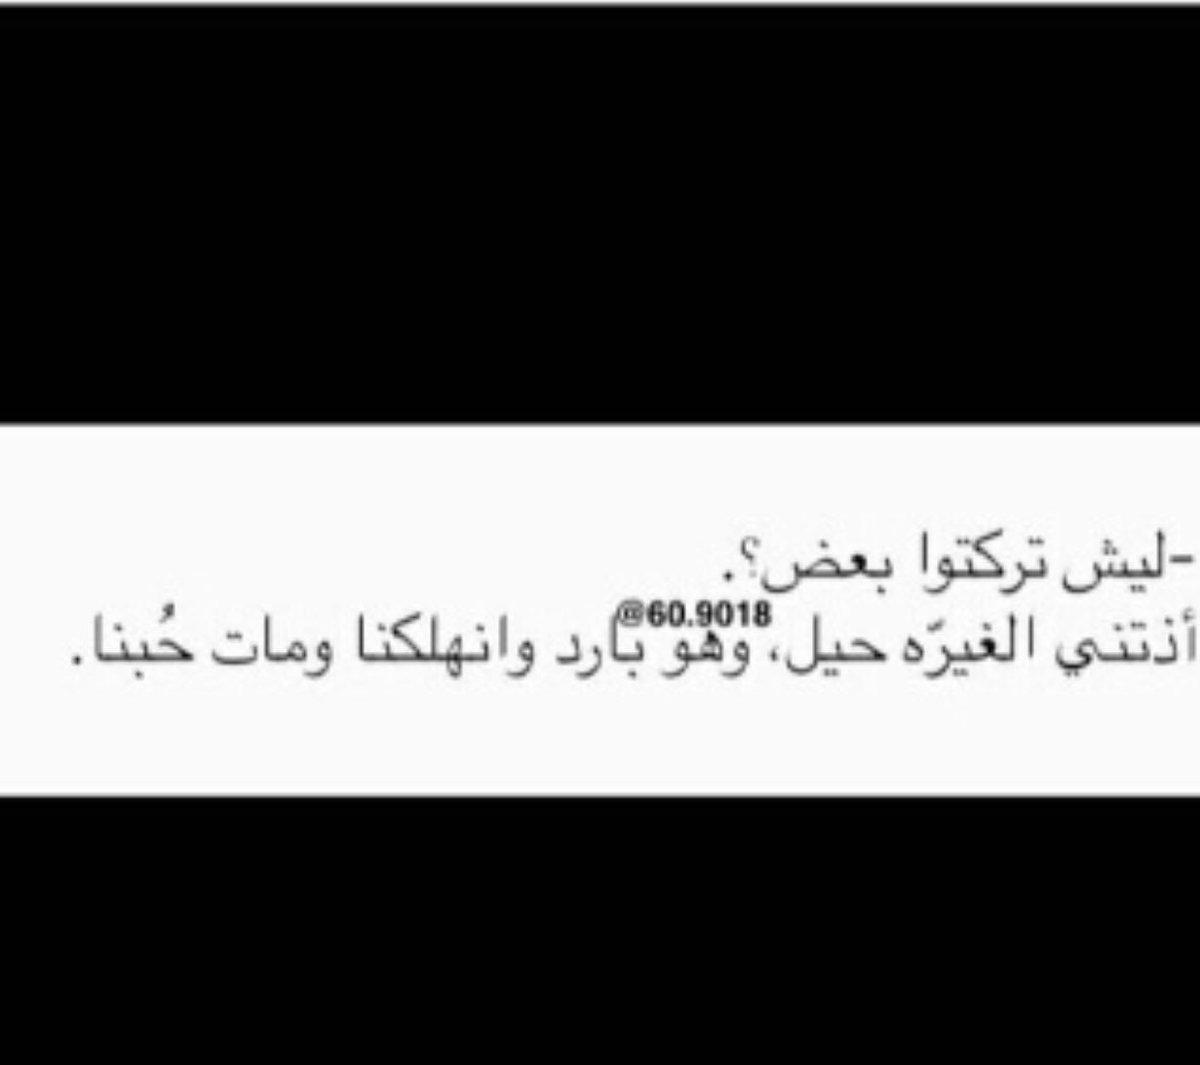 Ab On Twitter مات حبنا حب حزن خواطر حبيب الحبيب بيسيات خواطر